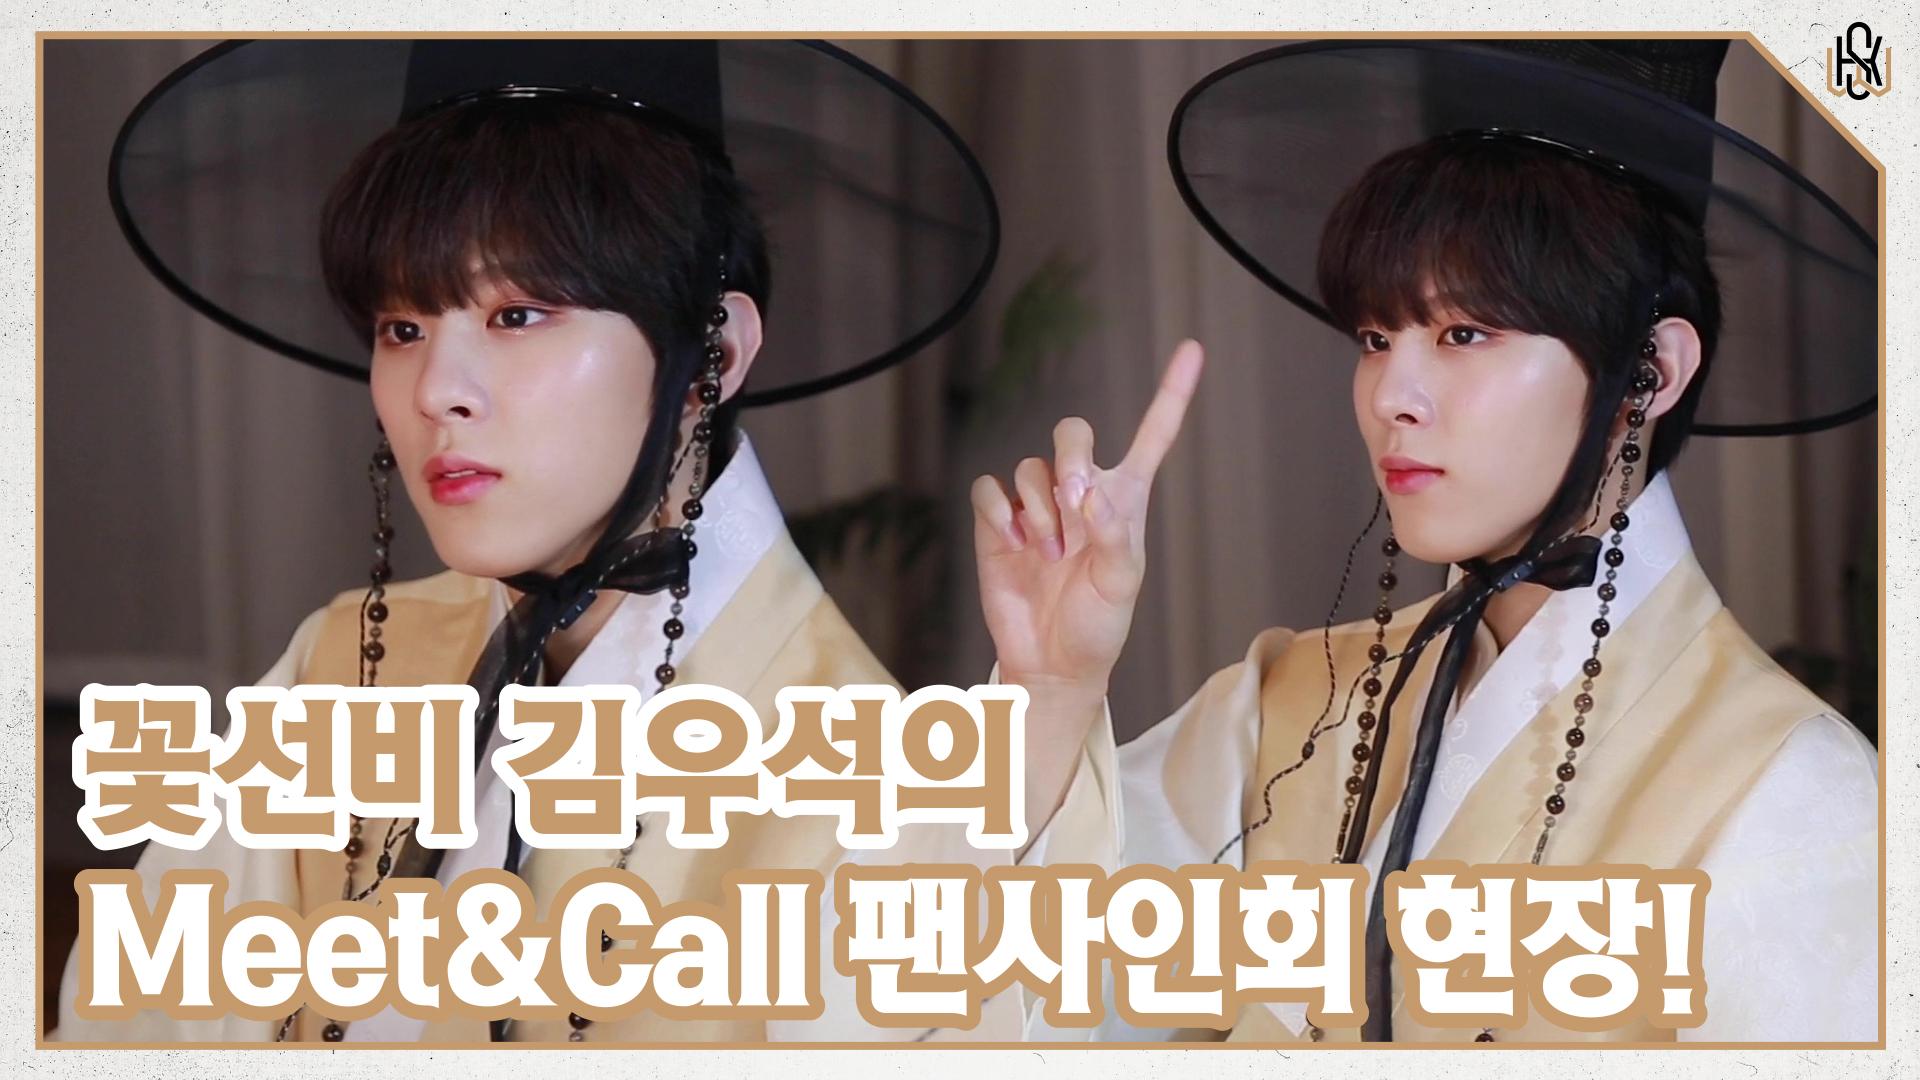 [WWW:] 꽃선비 김우석과 함께한 Meet&Call 팬사인회 현장🌸